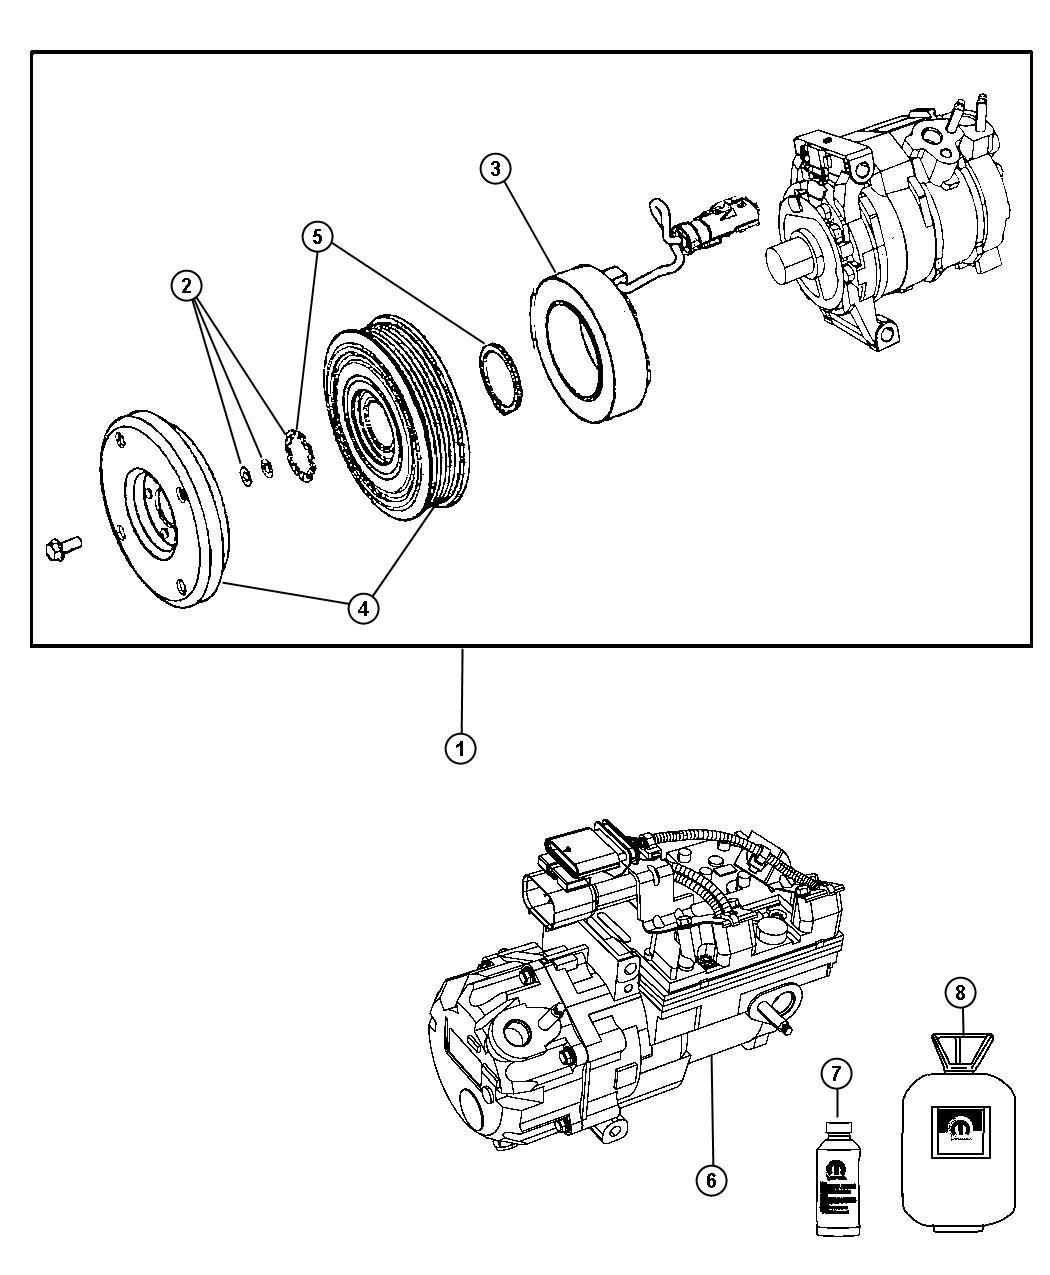 Dodge Durango Compressor Air Conditioning